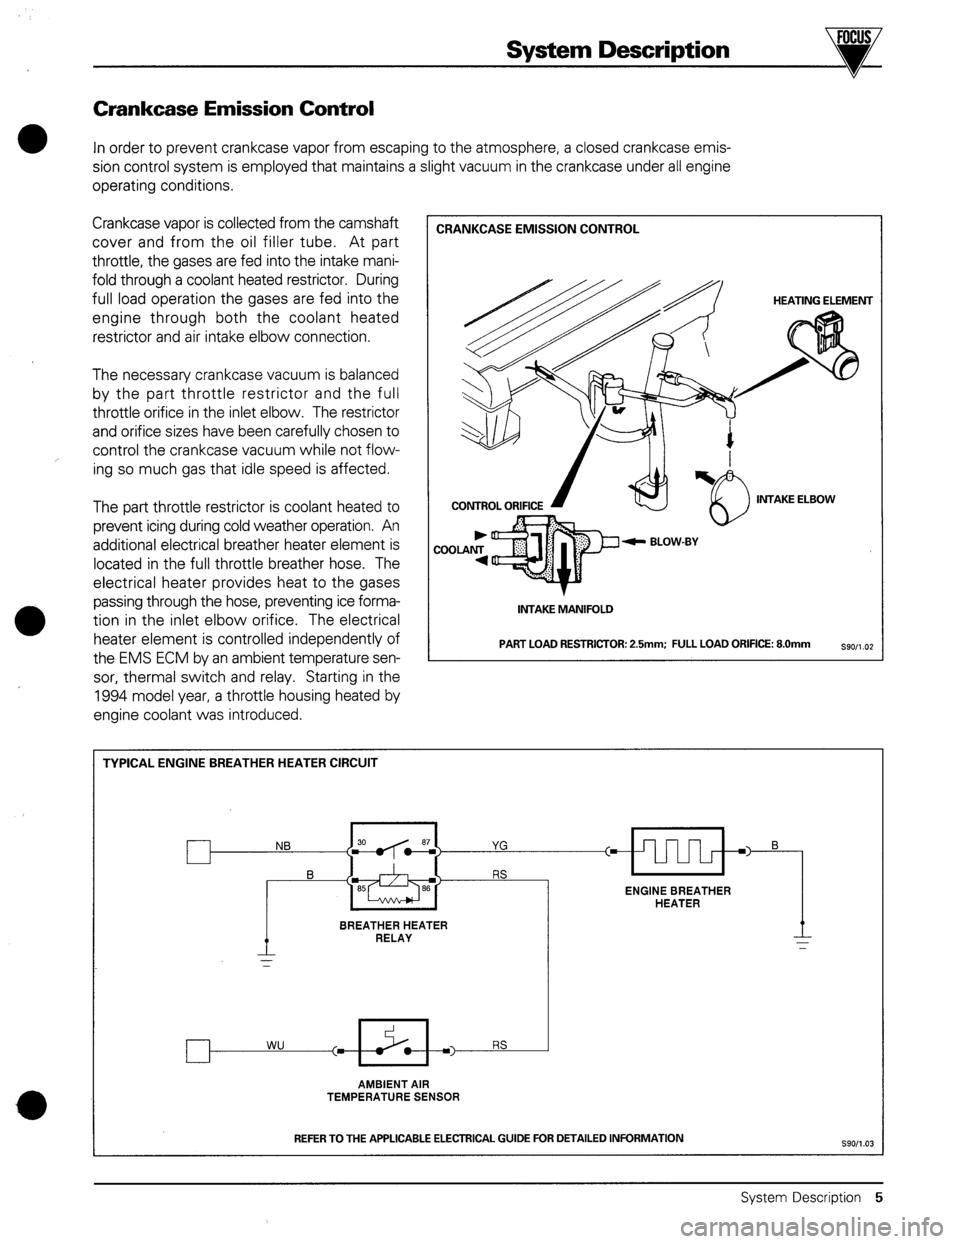 Jaguar Xjr 1994 X300 2g Aj6 40l Engine Management Syst Xj8 Sensor Diagram